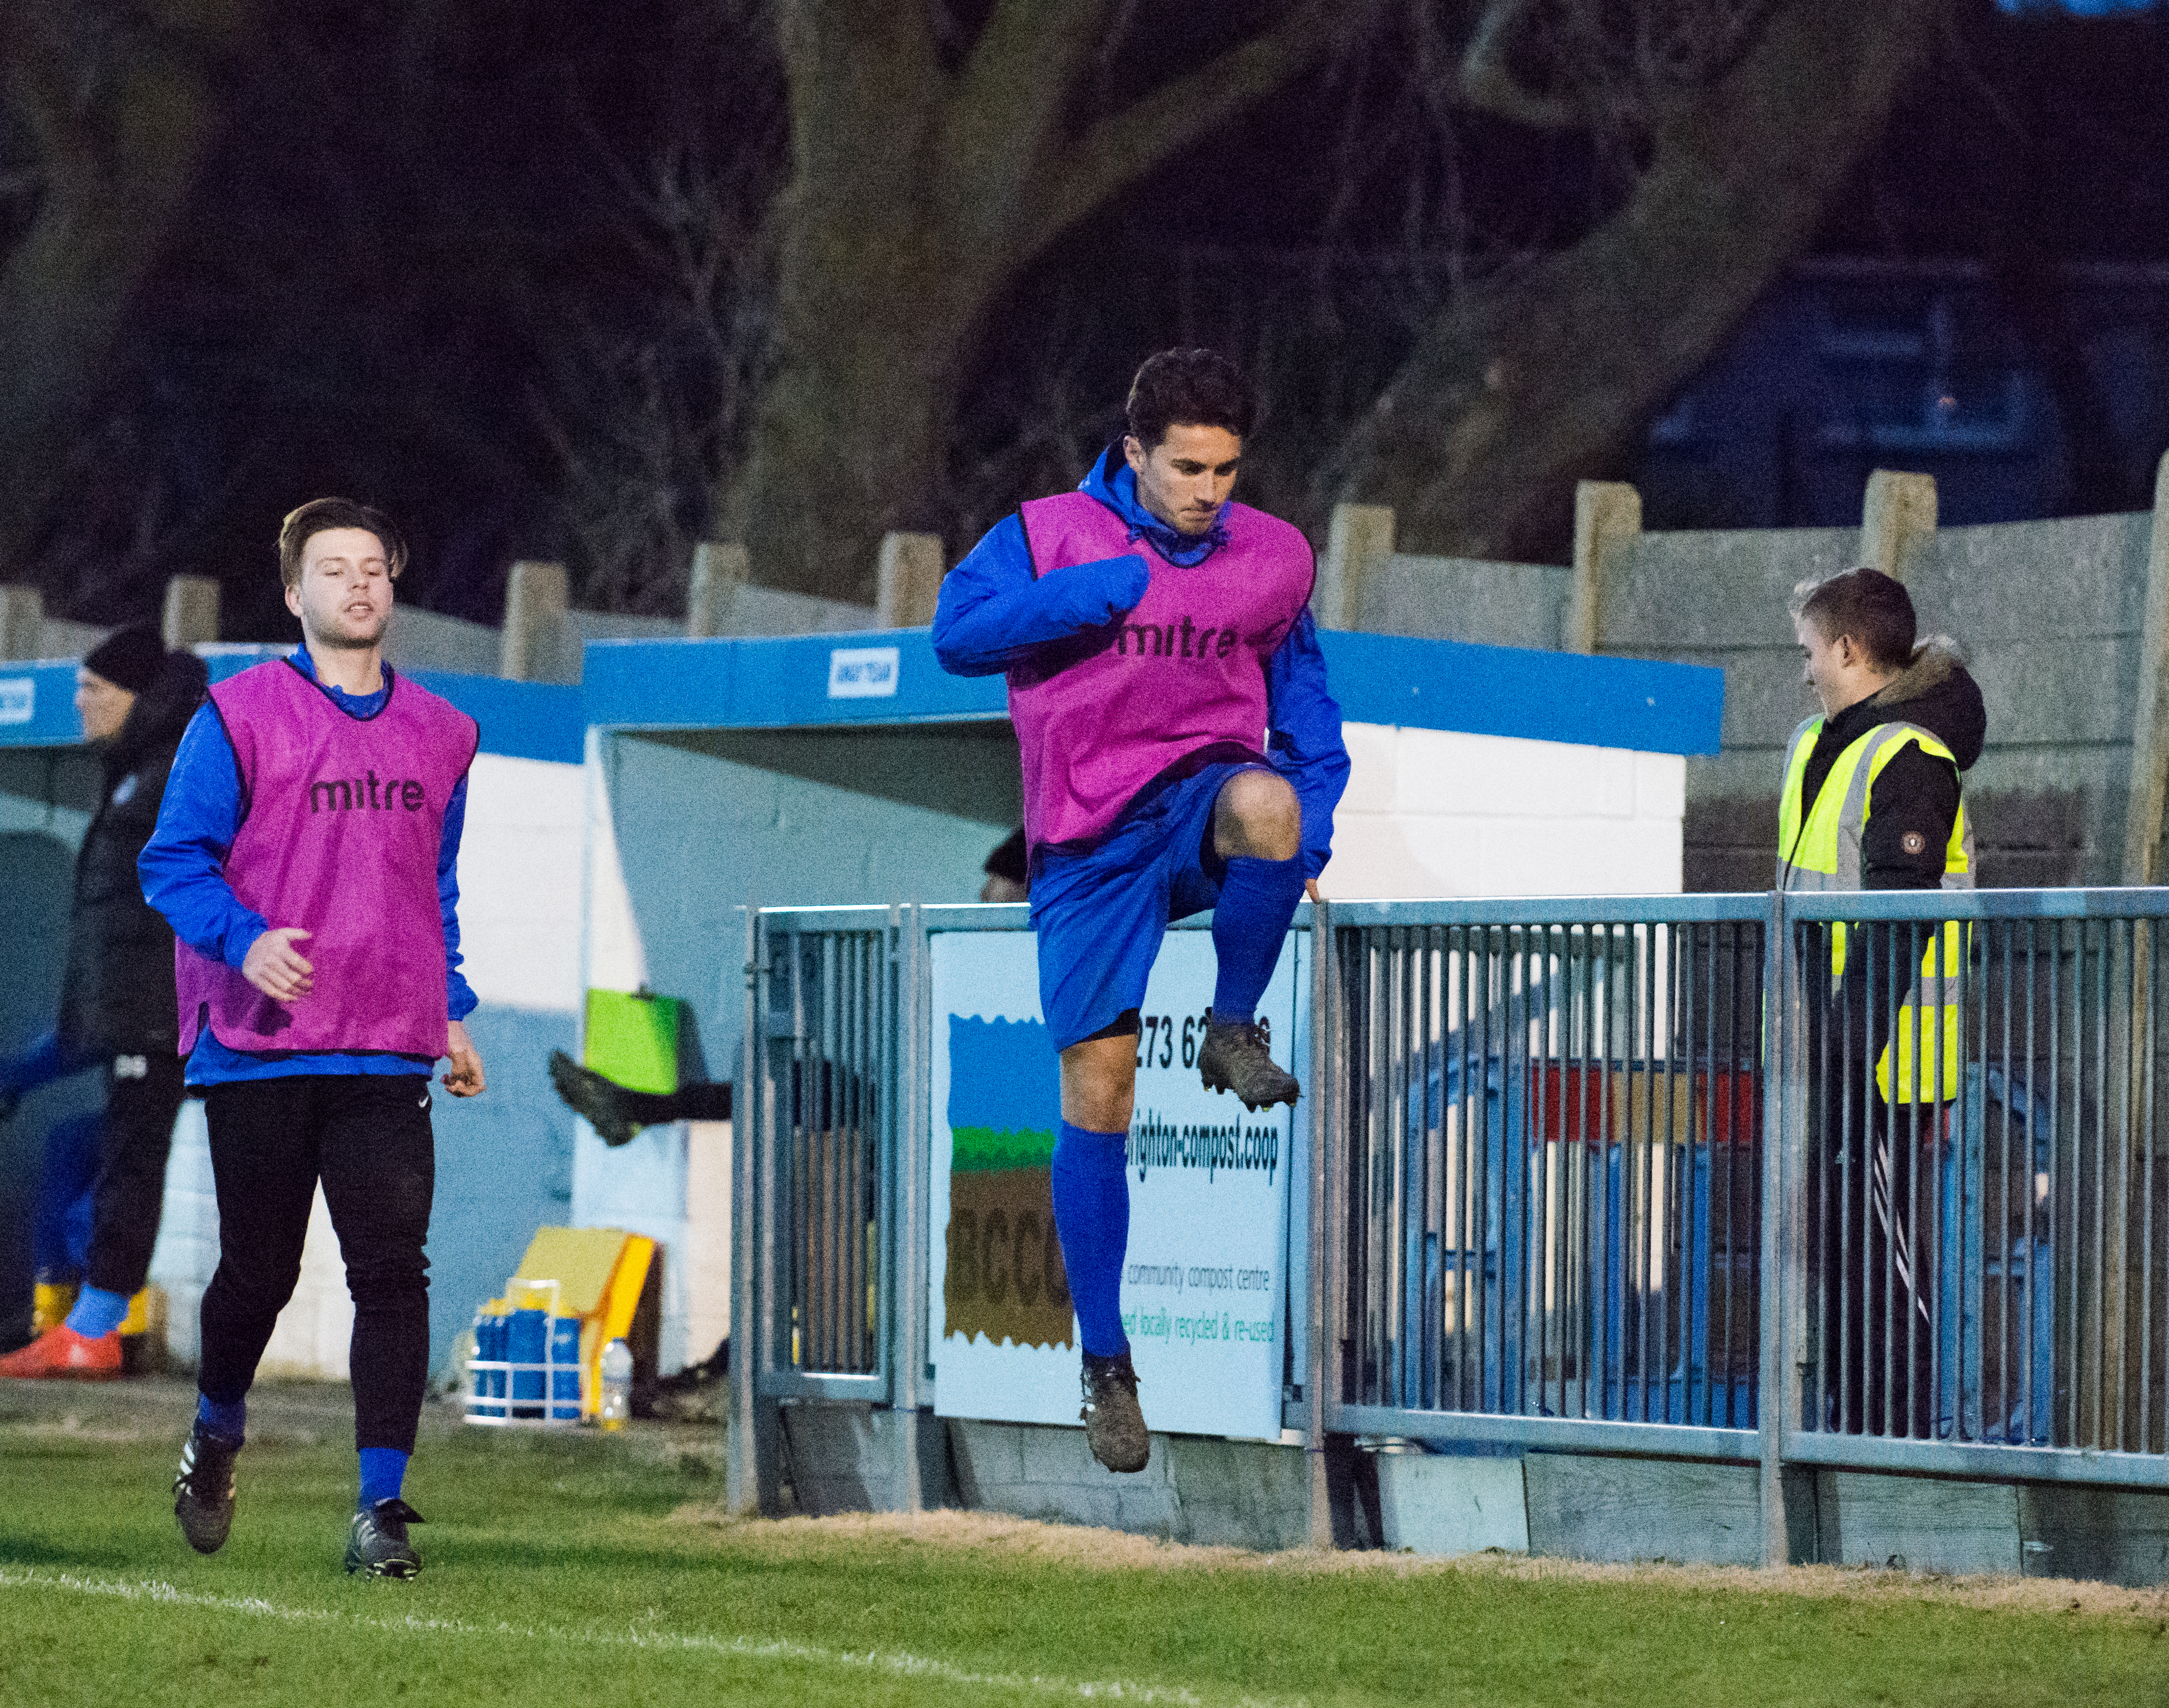 Shoreham FC vs Faversham Town 16.12.17 55